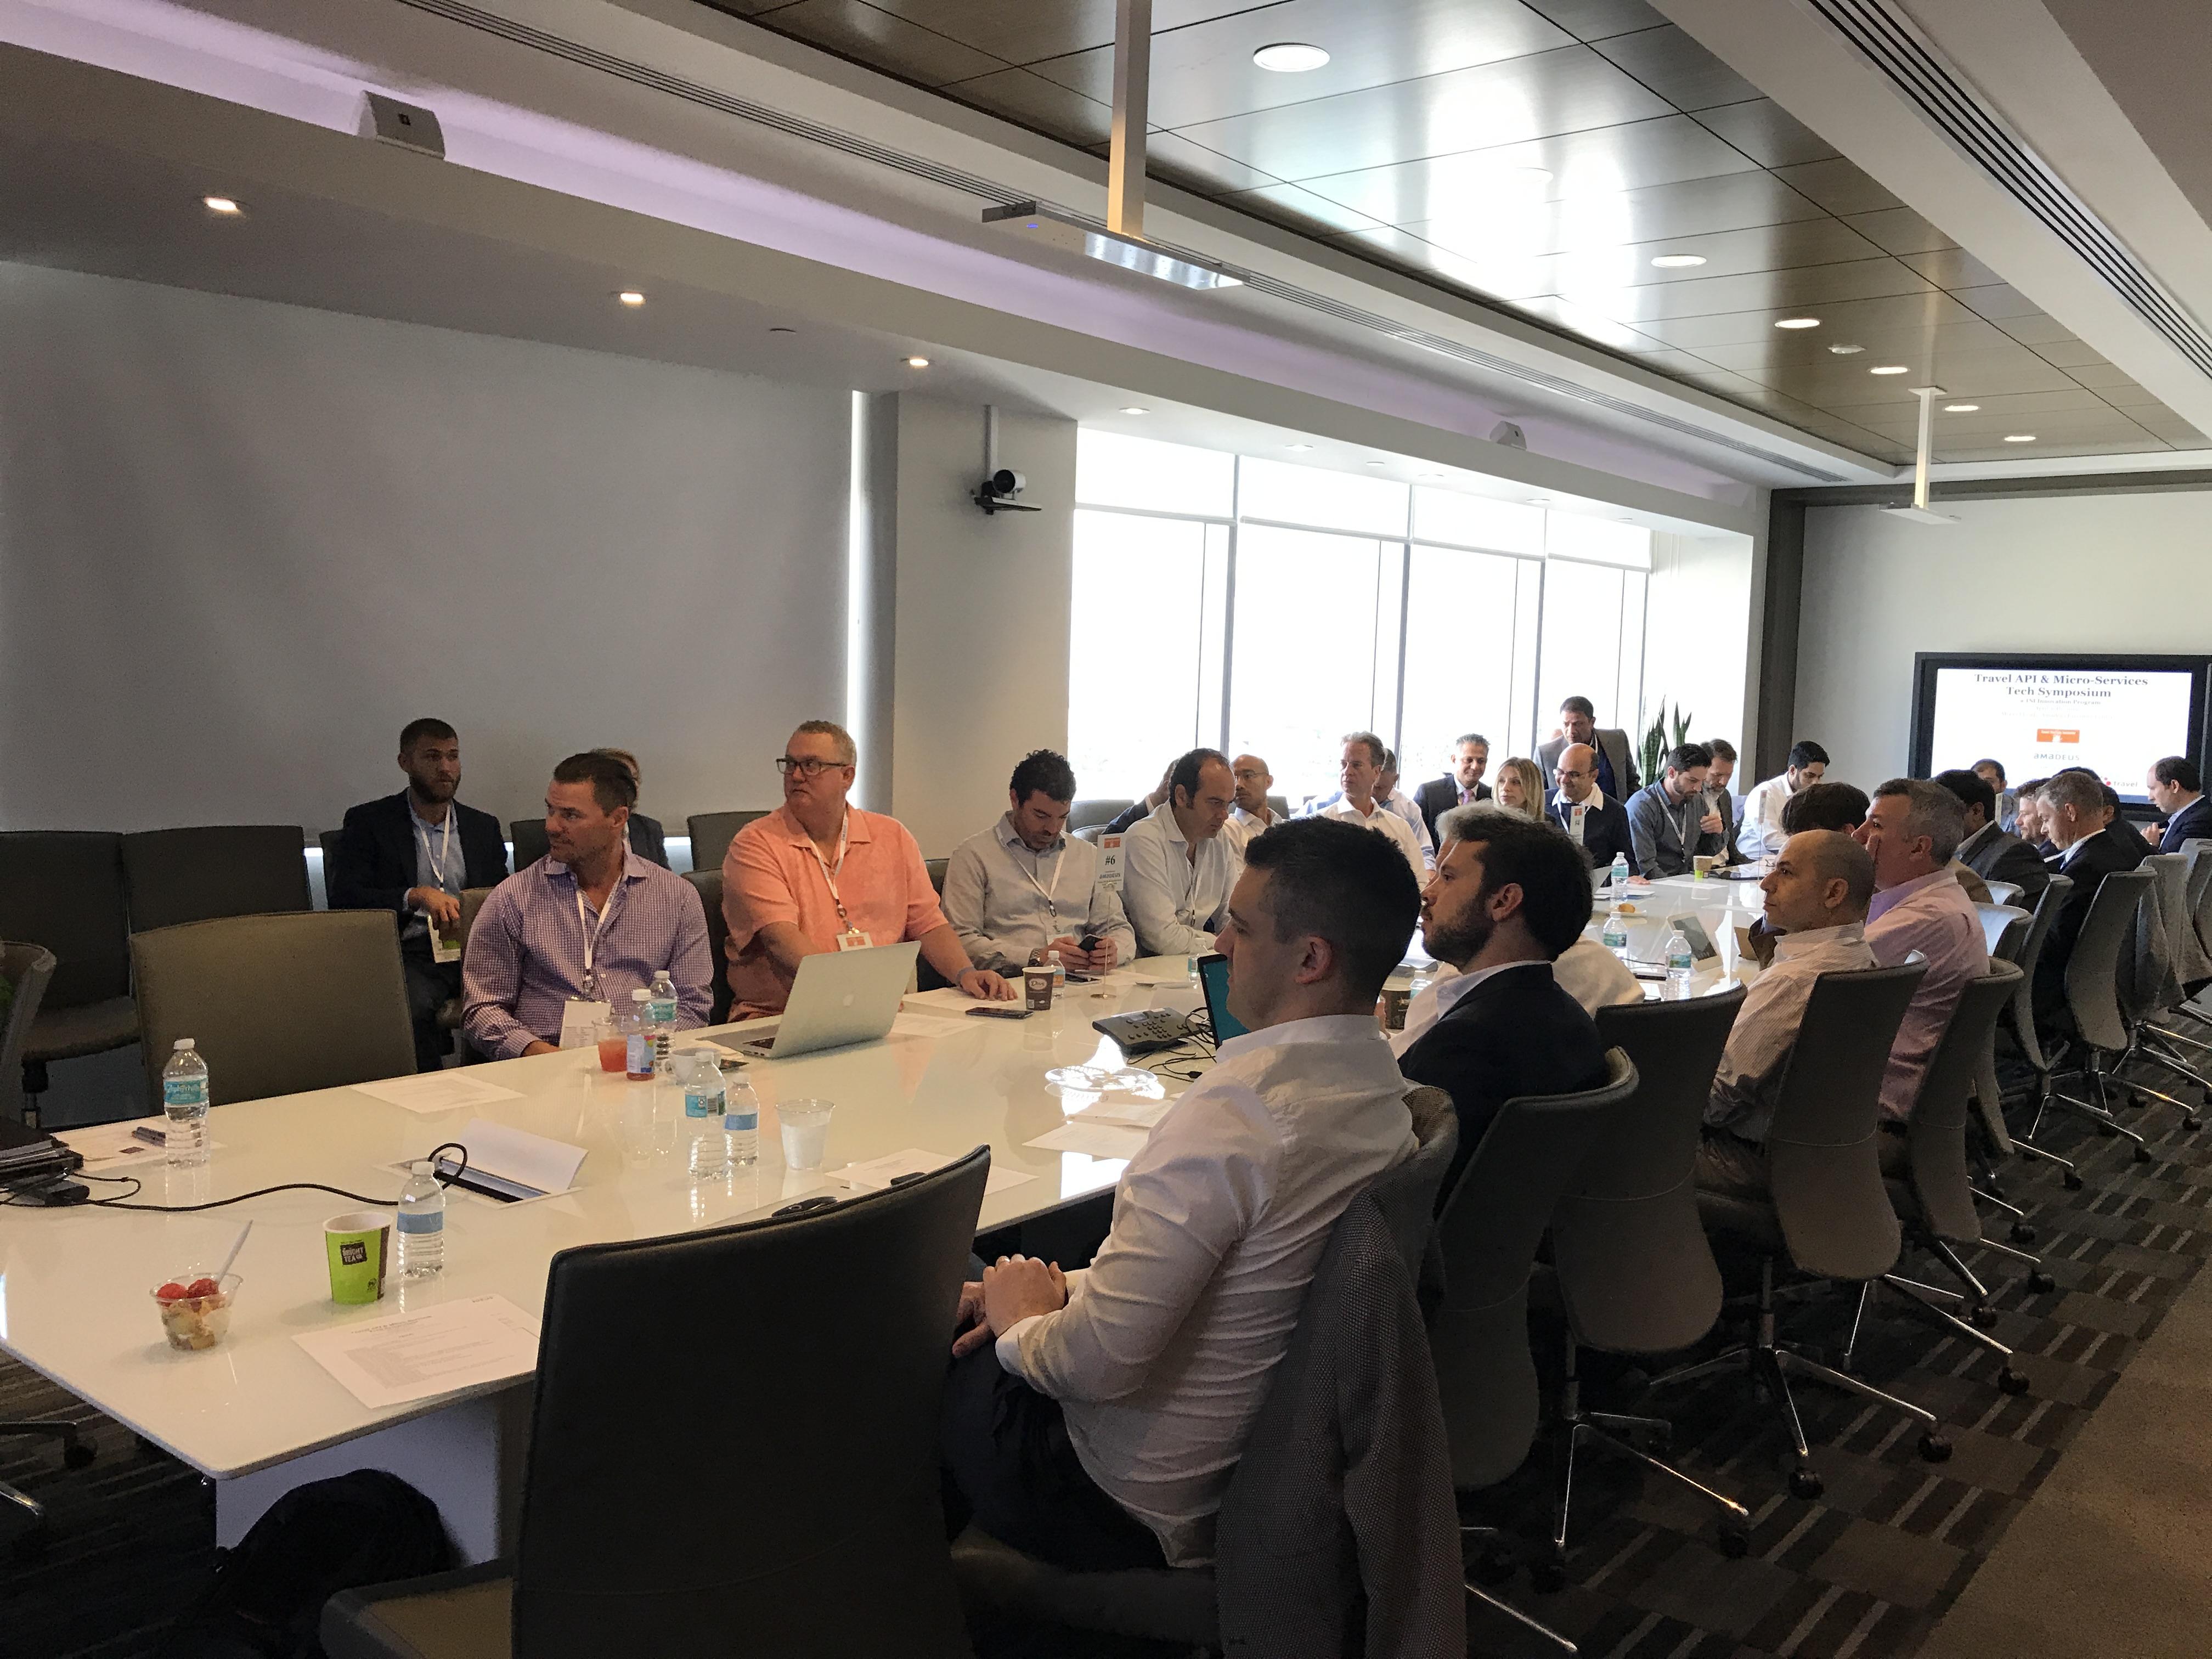 Travel API & Micro-Services Travel Tech Symposium April 30, 2019